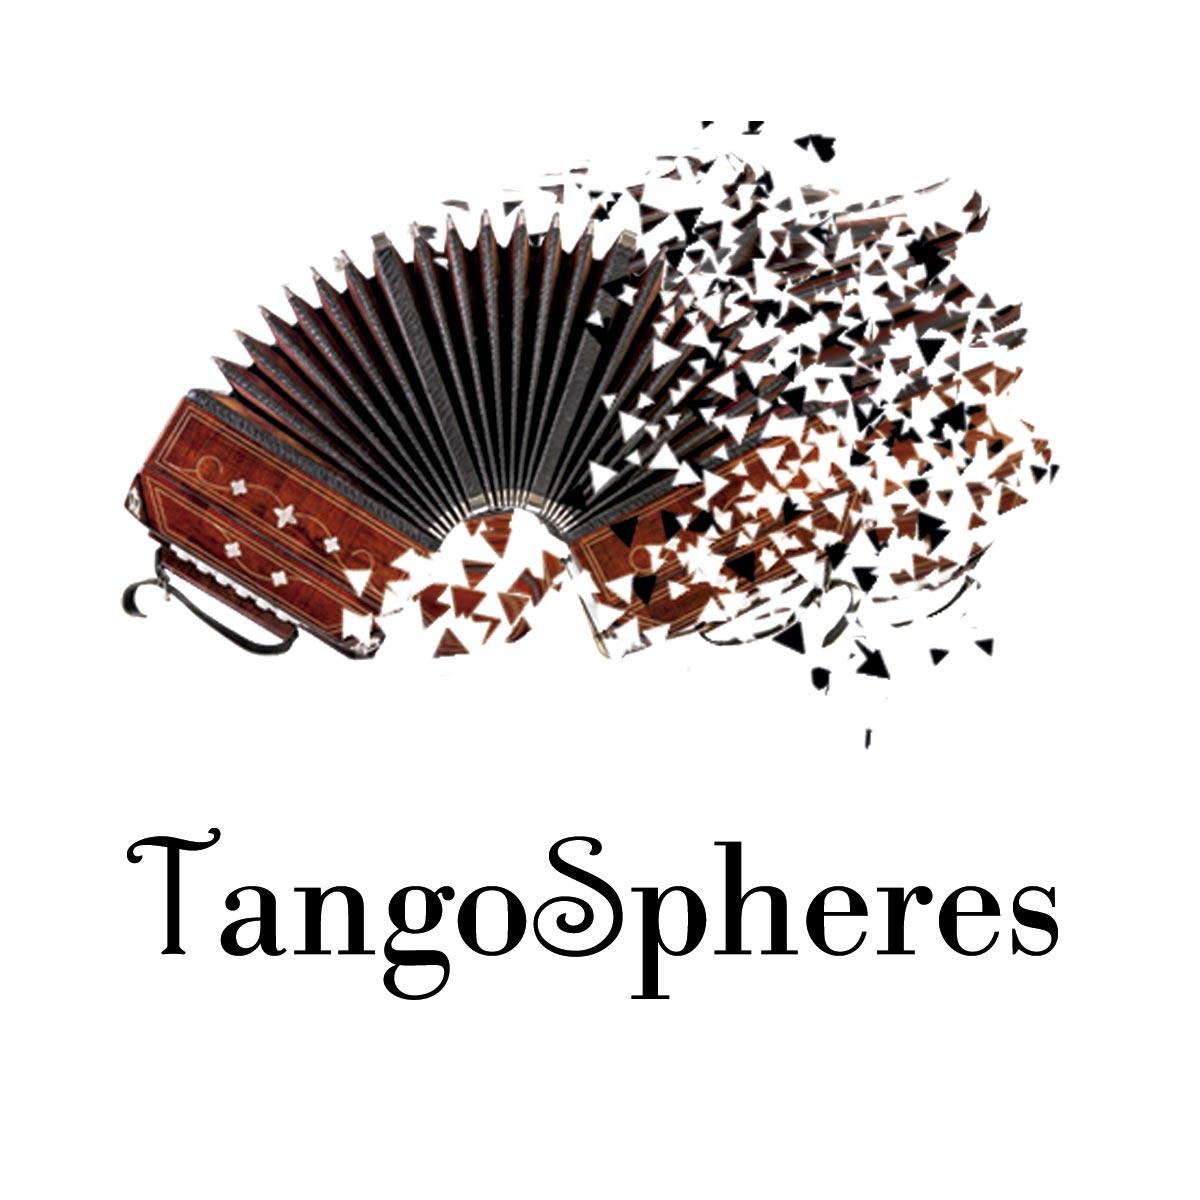 TangoSpheres logo